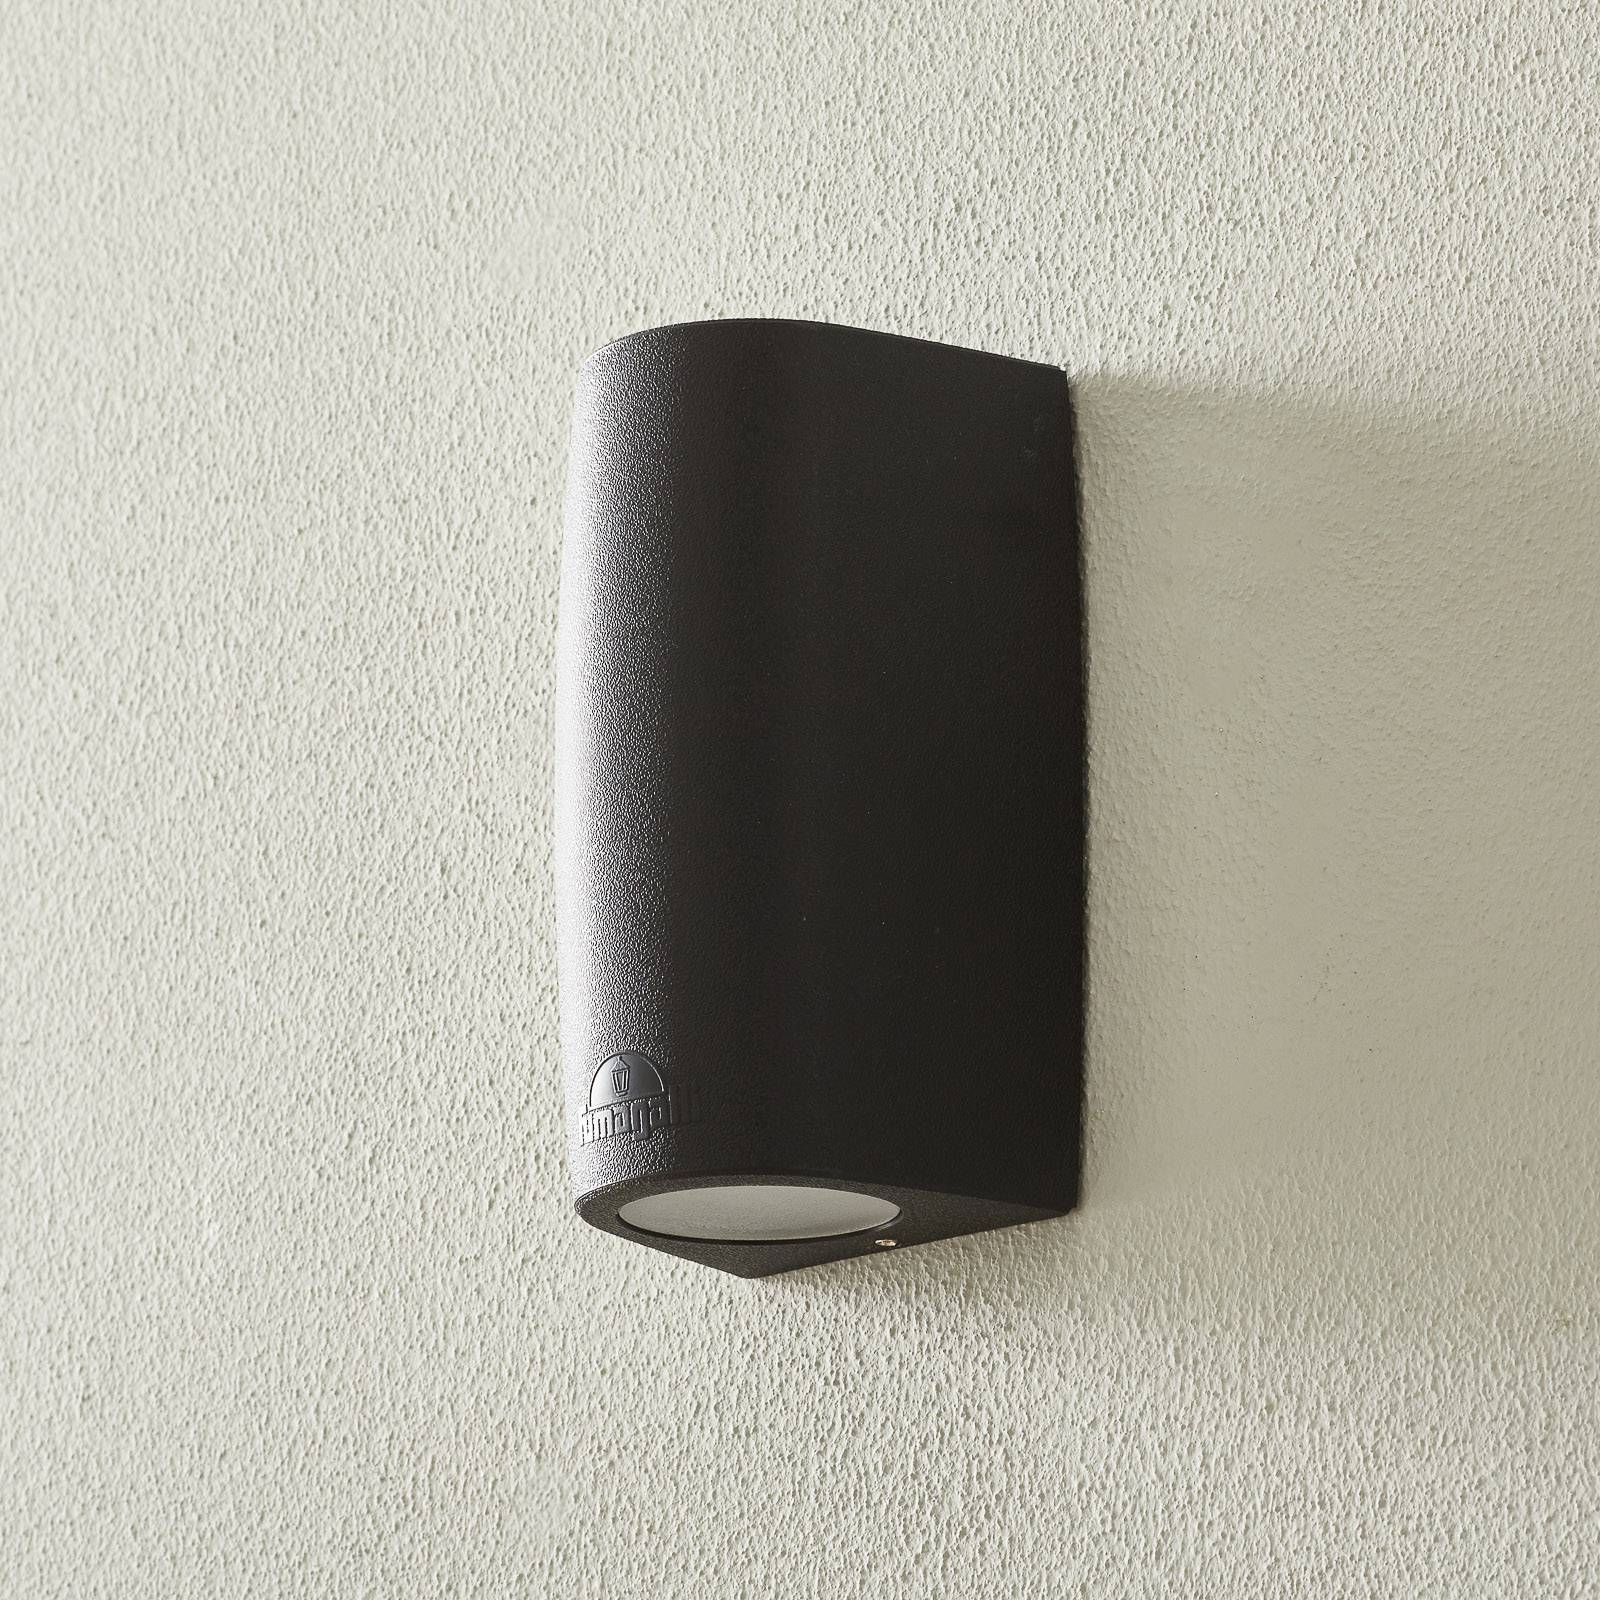 Marta-seinälamppu 9,2 cm 1-lamp. CCT musta/frosted